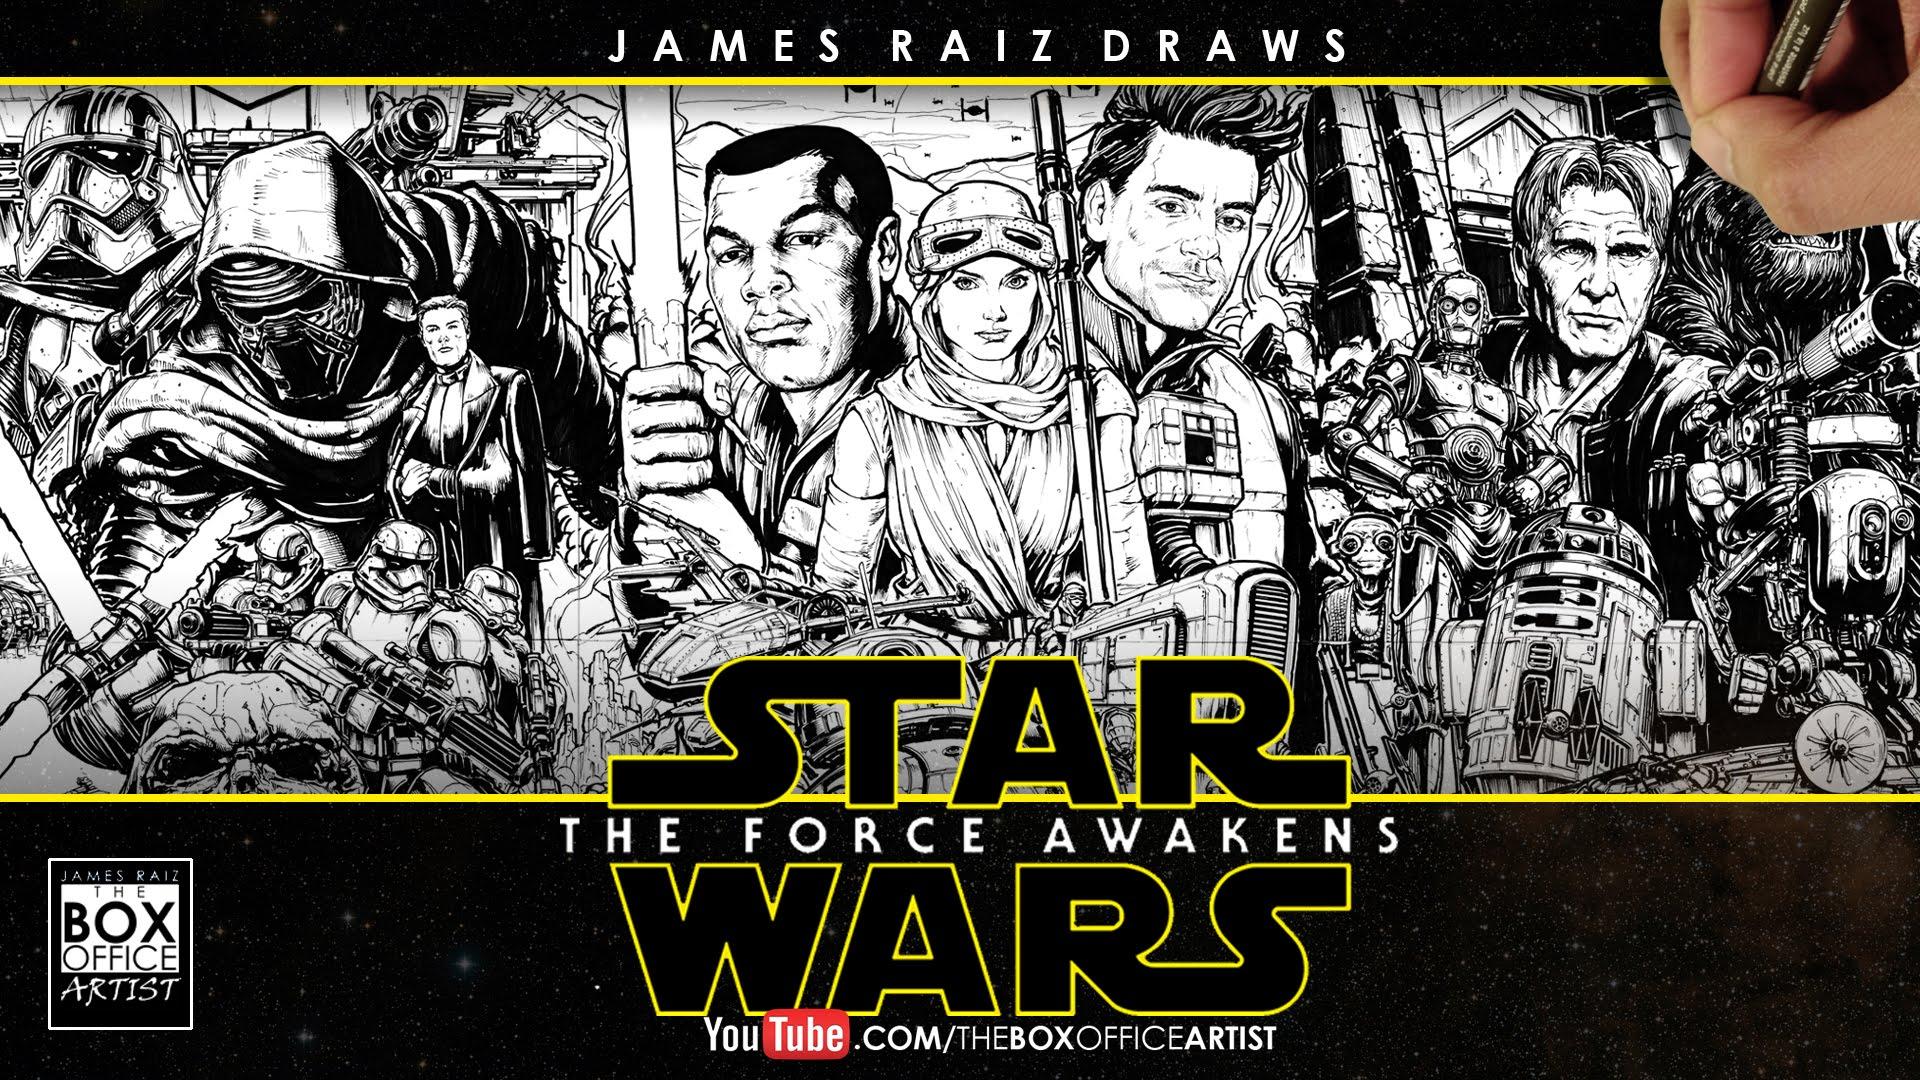 Drawn office art  TRAILER FORCE WARS: STAR